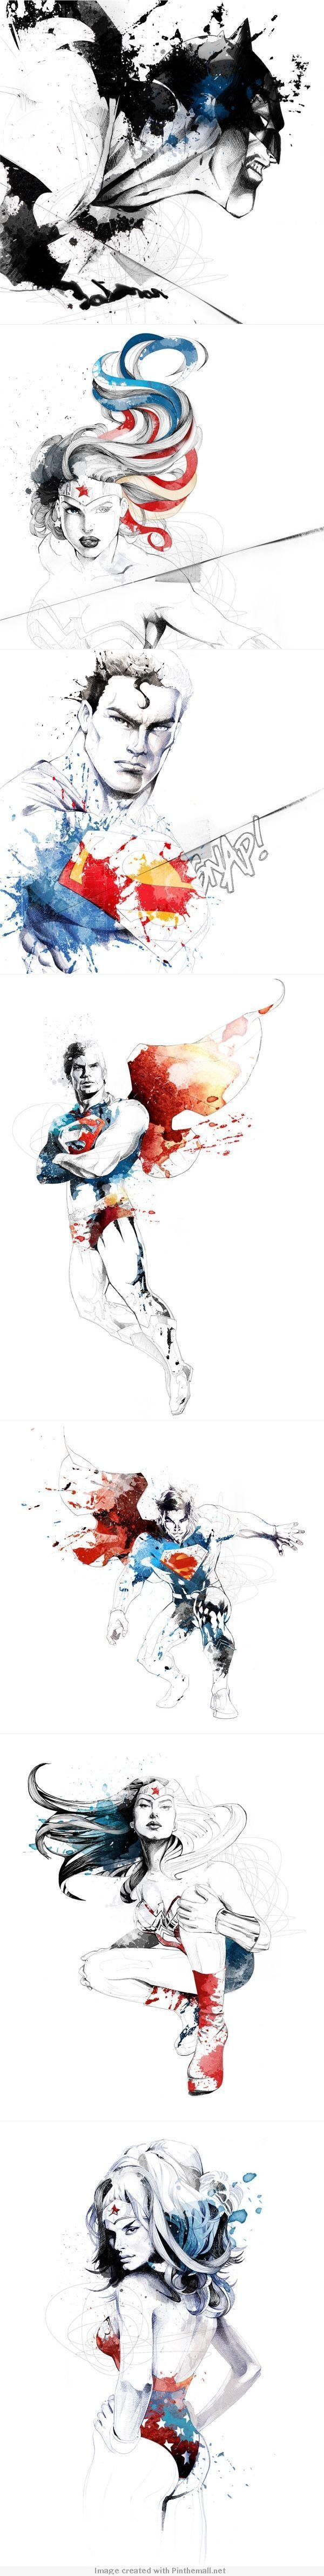 Fua!! Sobran los palabros. Pa flipar. Me encanta. DC COMICS by david despau - Visit now to grab yourself a super hero shirt today at 40% off! - Visit to grab an amazing super hero shirt now on sale!